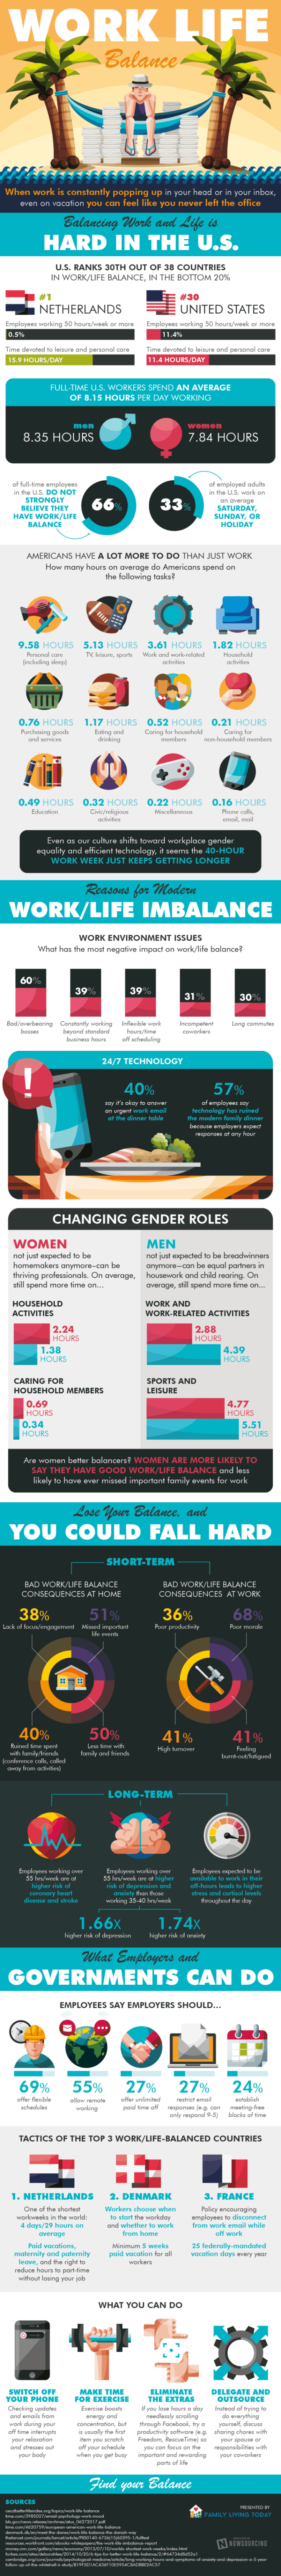 Work/Life Balance in the Modern Era Infographic